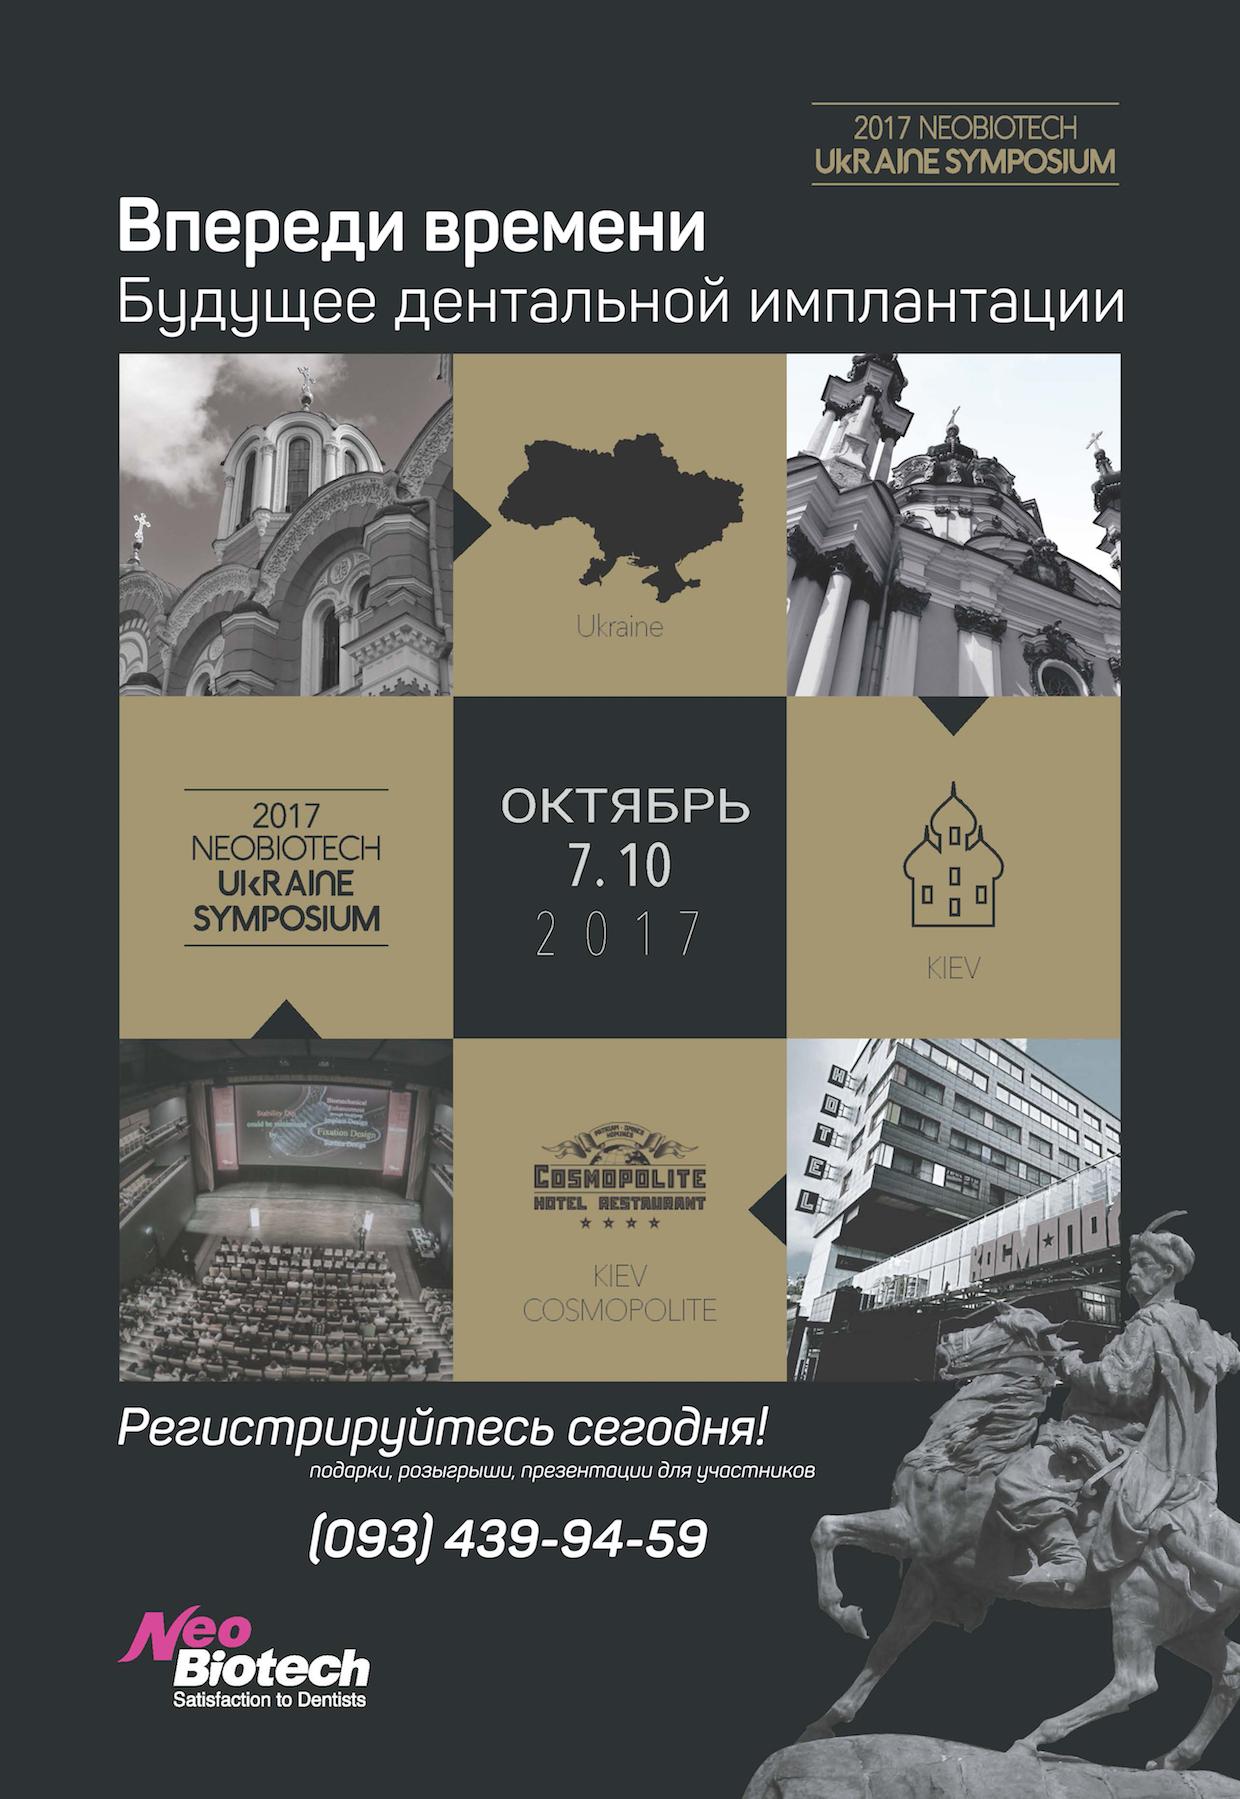 NeoBiotech Ukraine Symposium 2017 | Симпозиум в Киеве